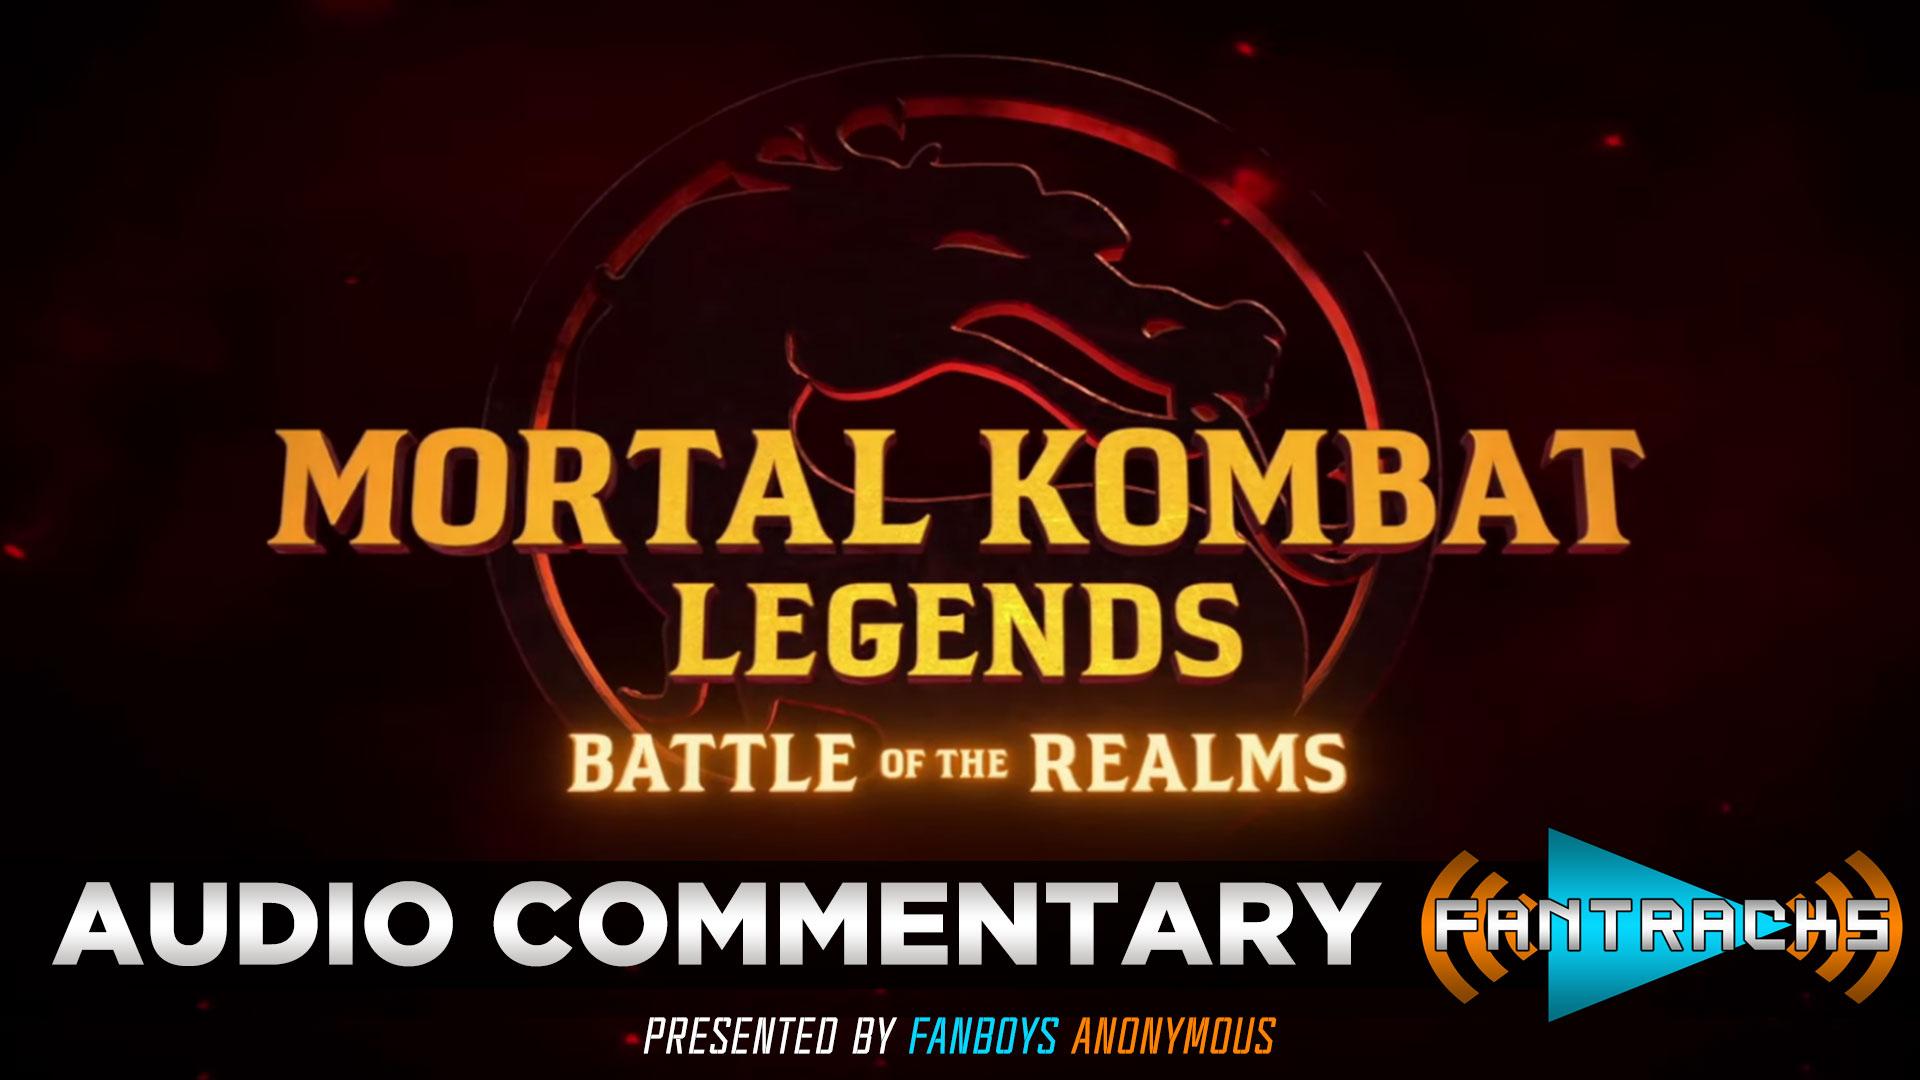 FanTracks Mortal Kombat Legends: Battle of the Realms audio commentary